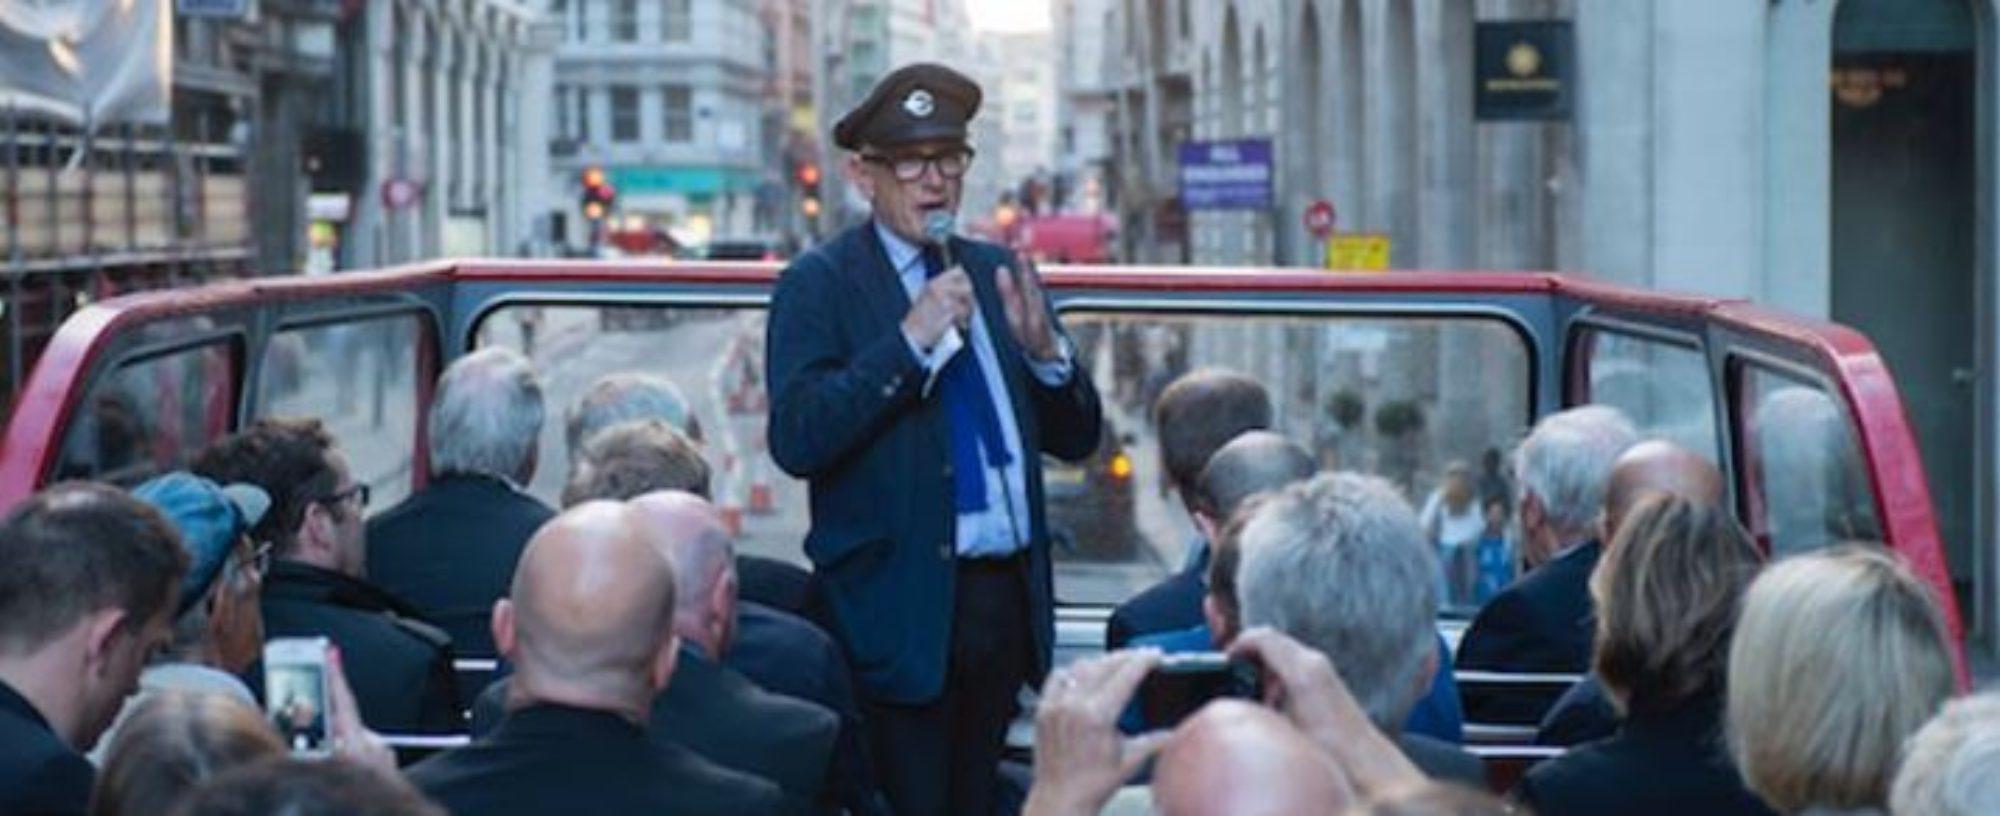 Matt Massey - tour guide on Peter Hendy's Routemaster trip